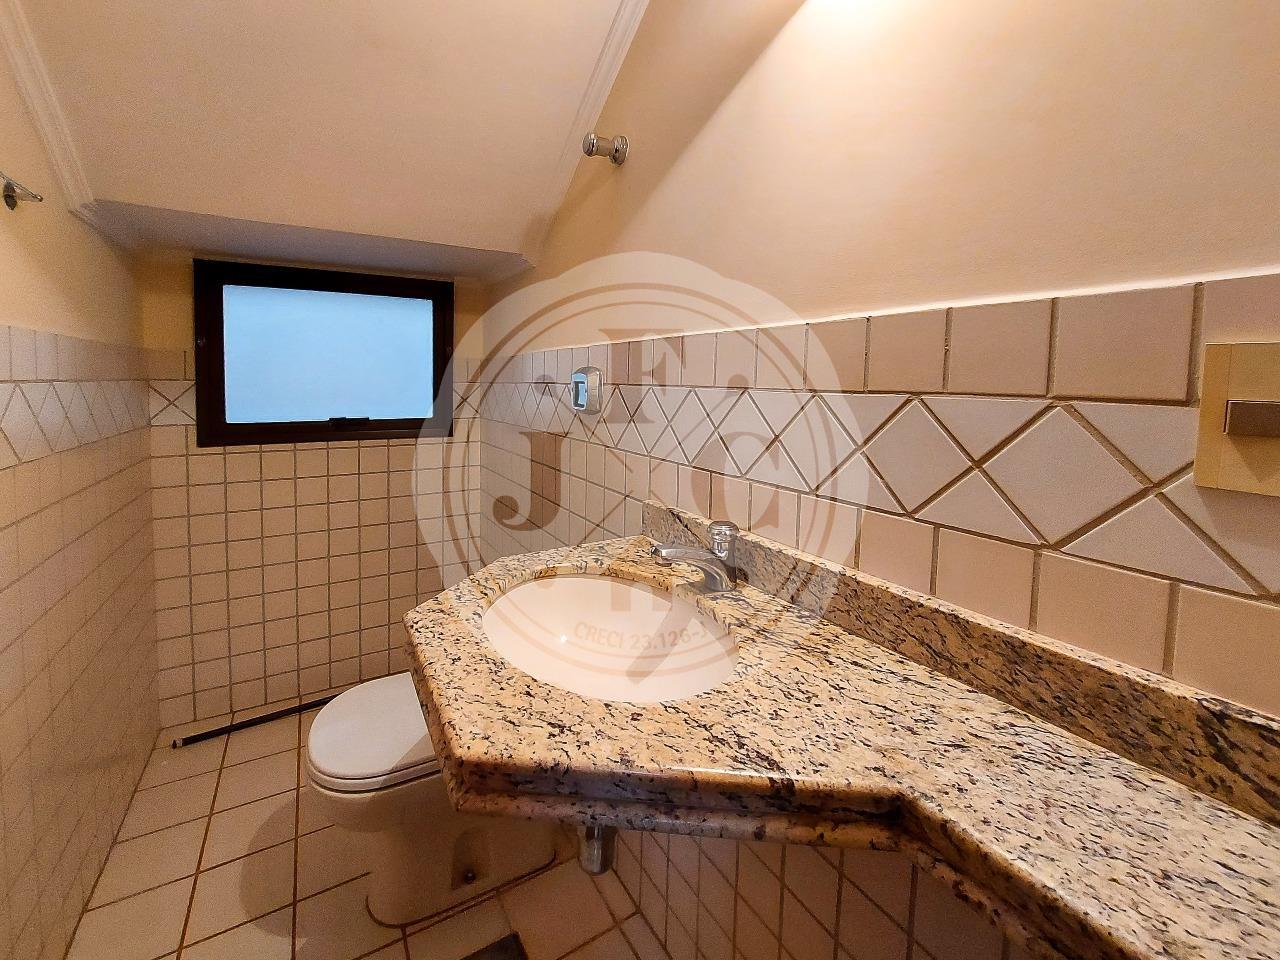 Casa em Condomínio à venda no Condomínio Santa Helena: Lavabo